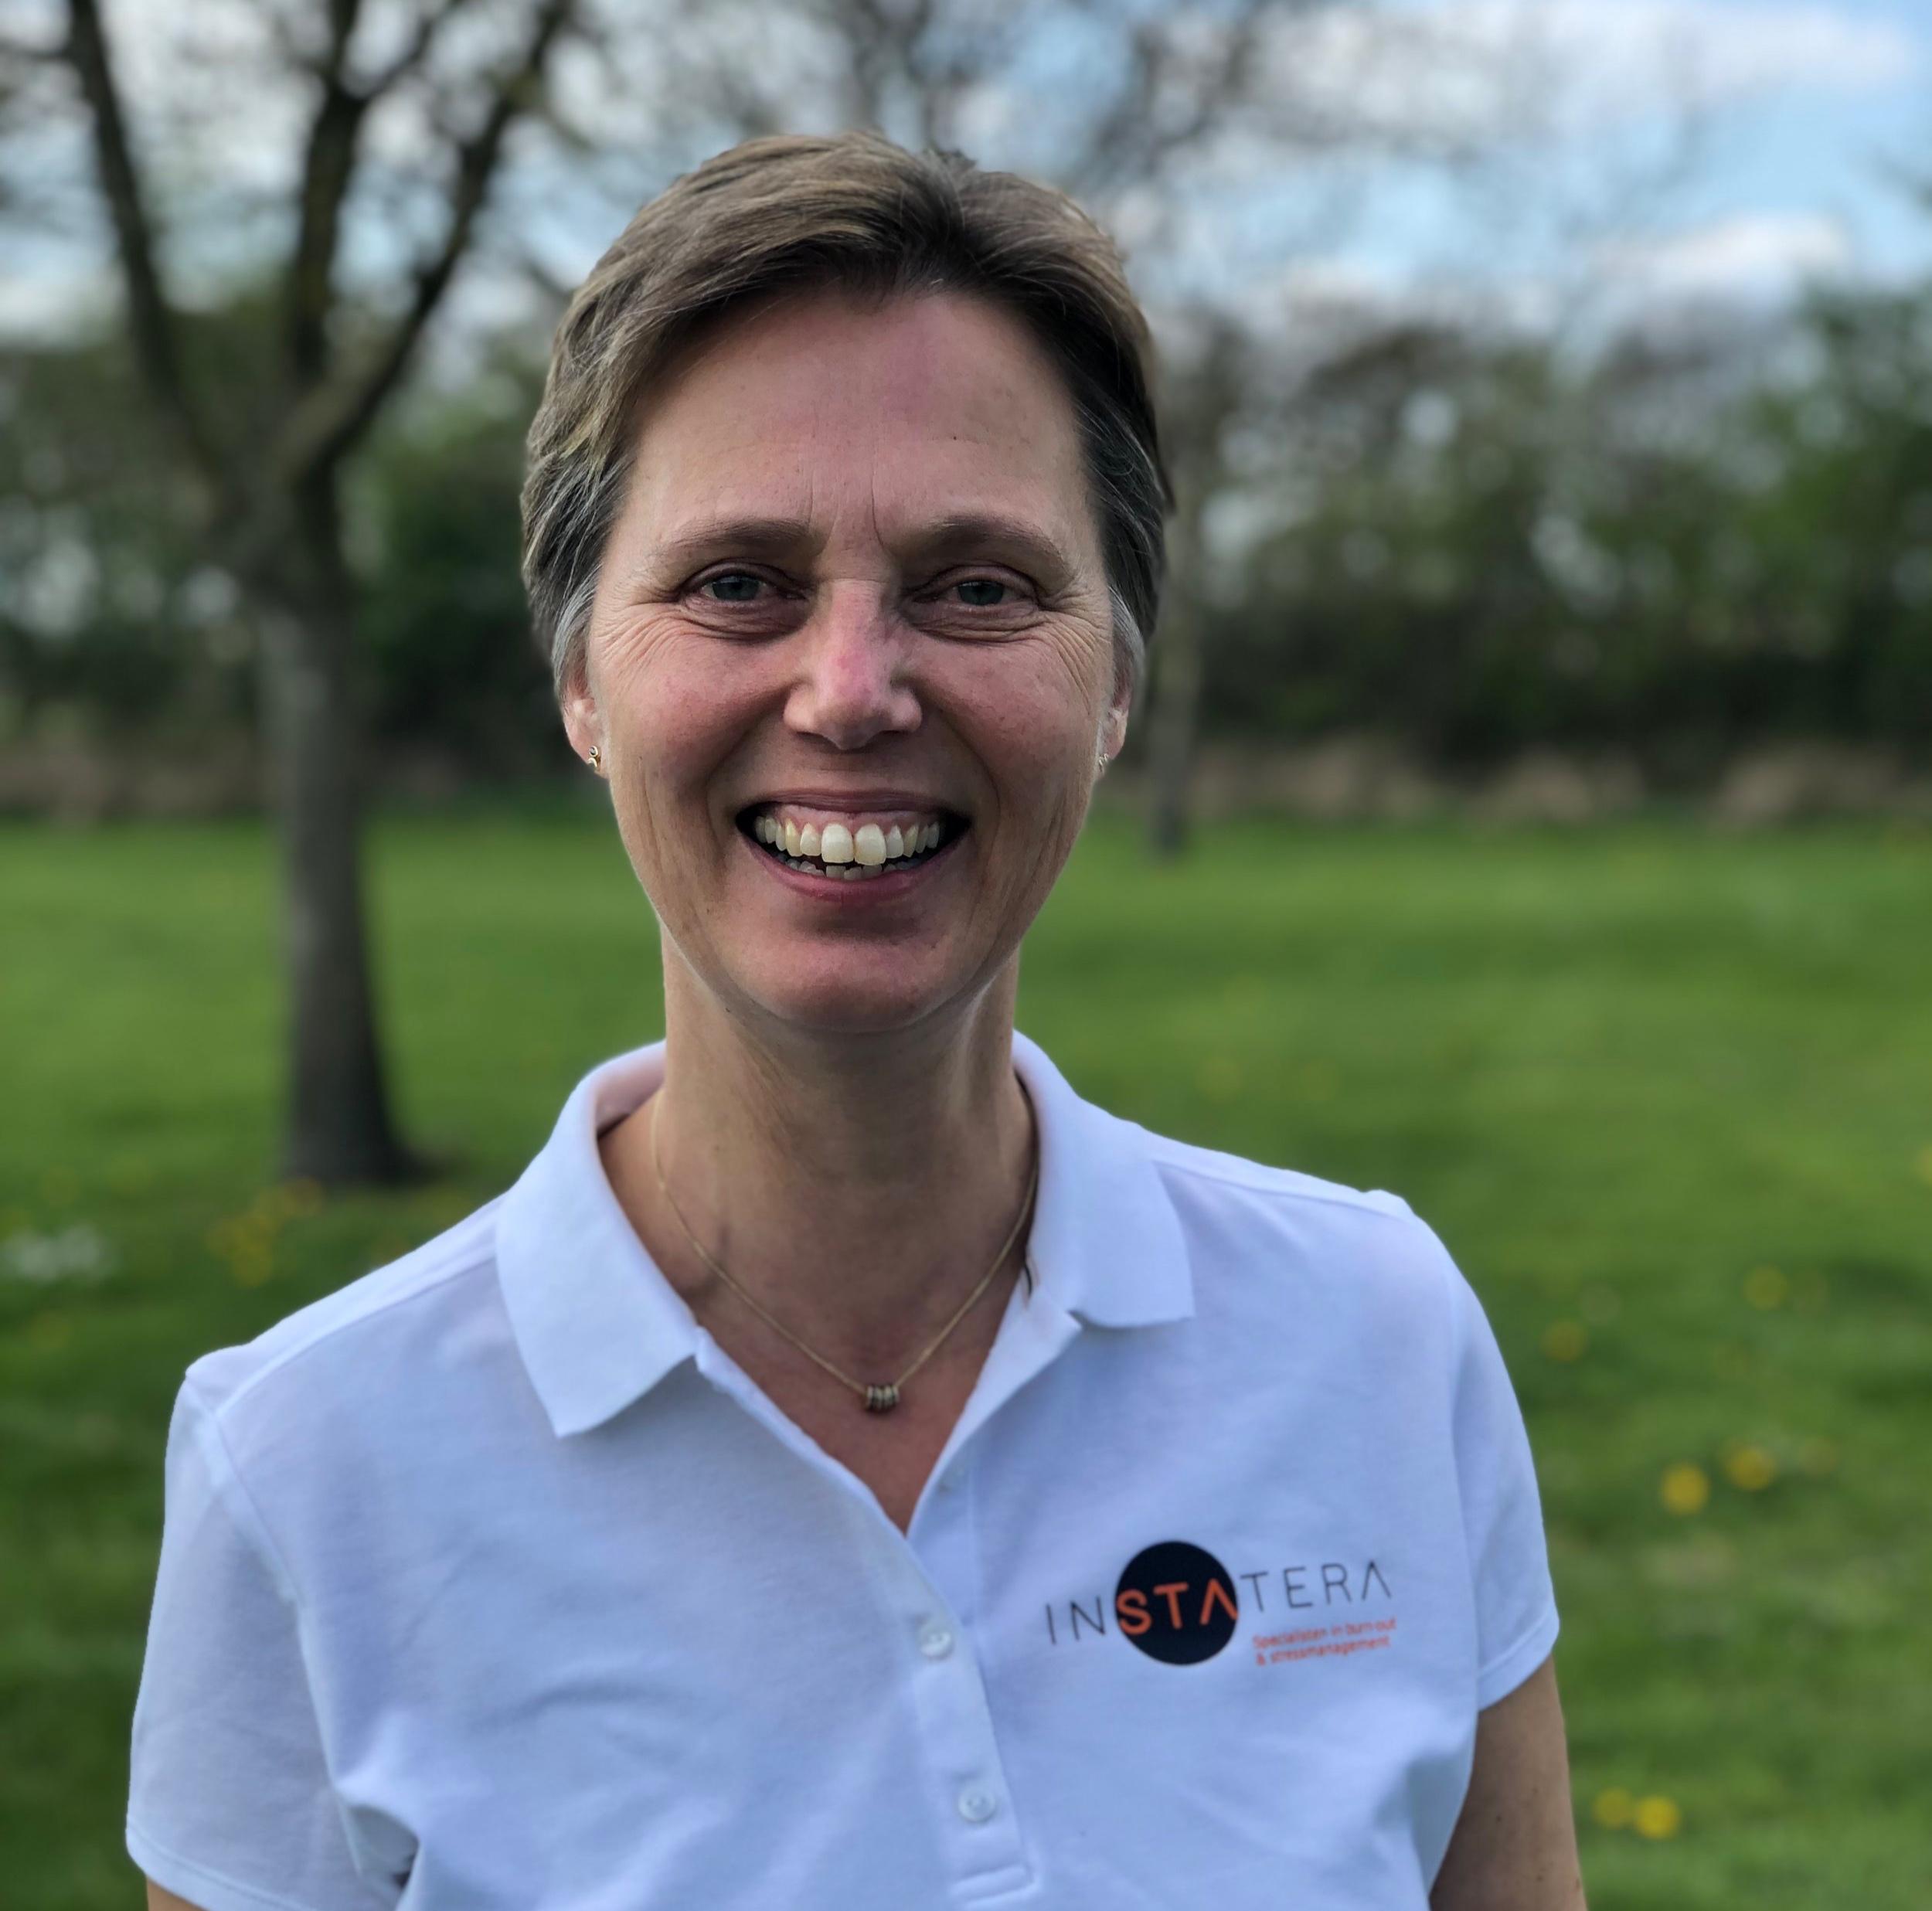 Laura van den Boogaard - Burn-out & stress specialist Instatera